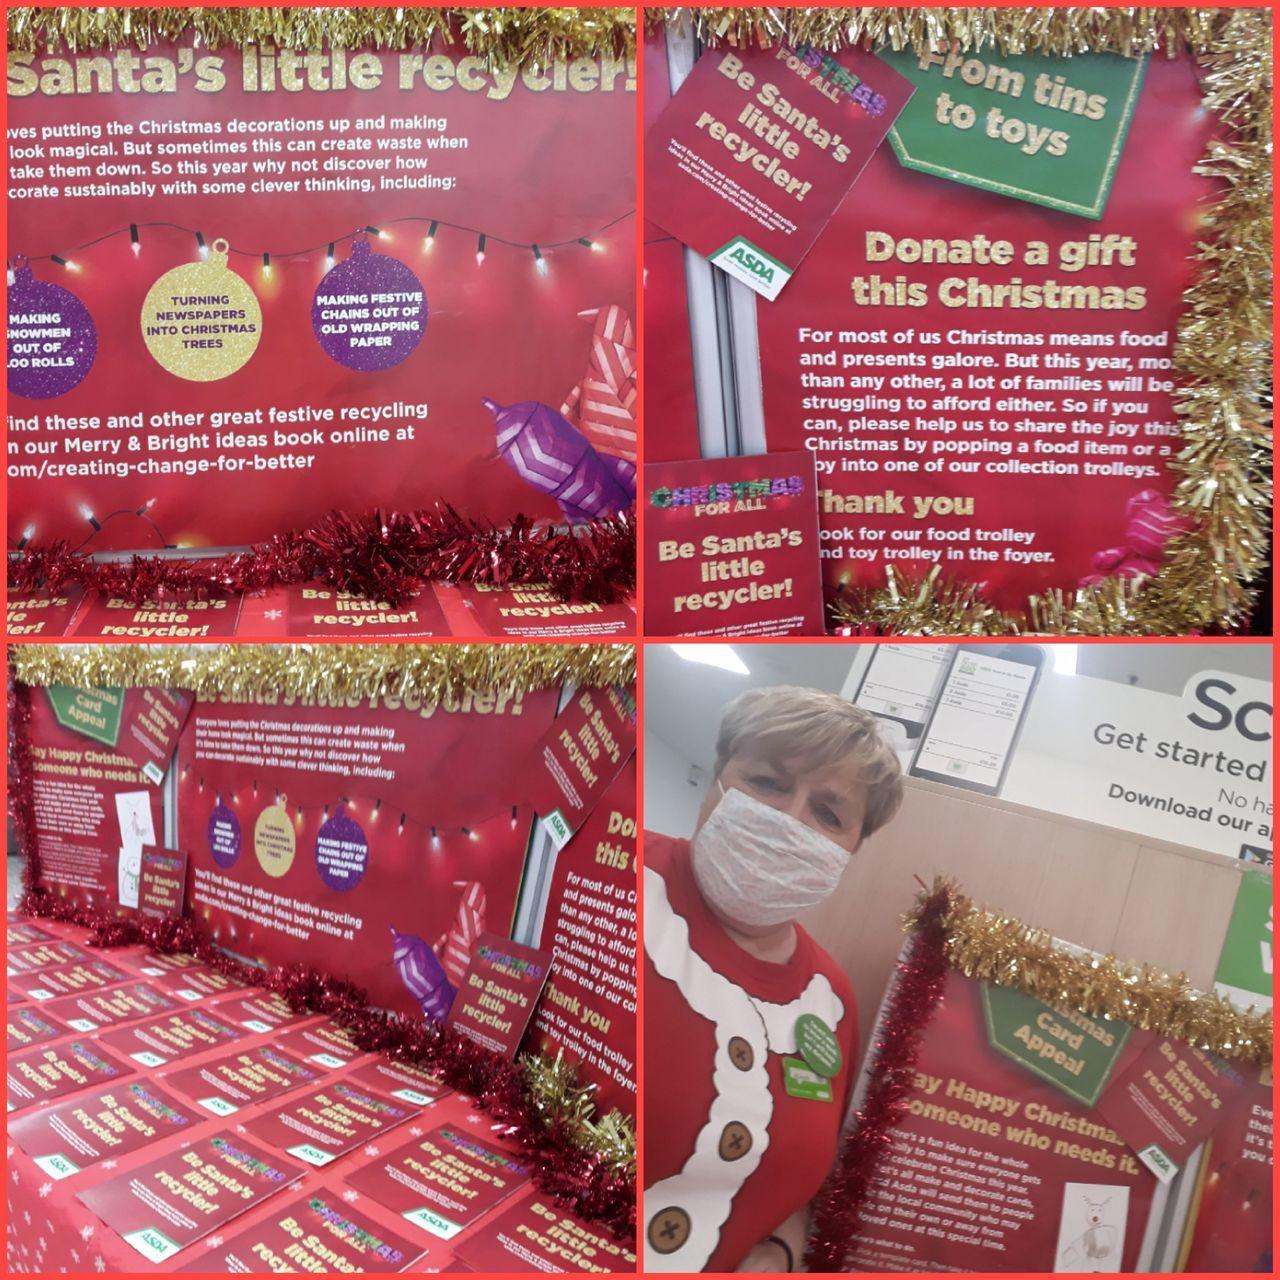 Santas little recyclers | Asda Gosforth